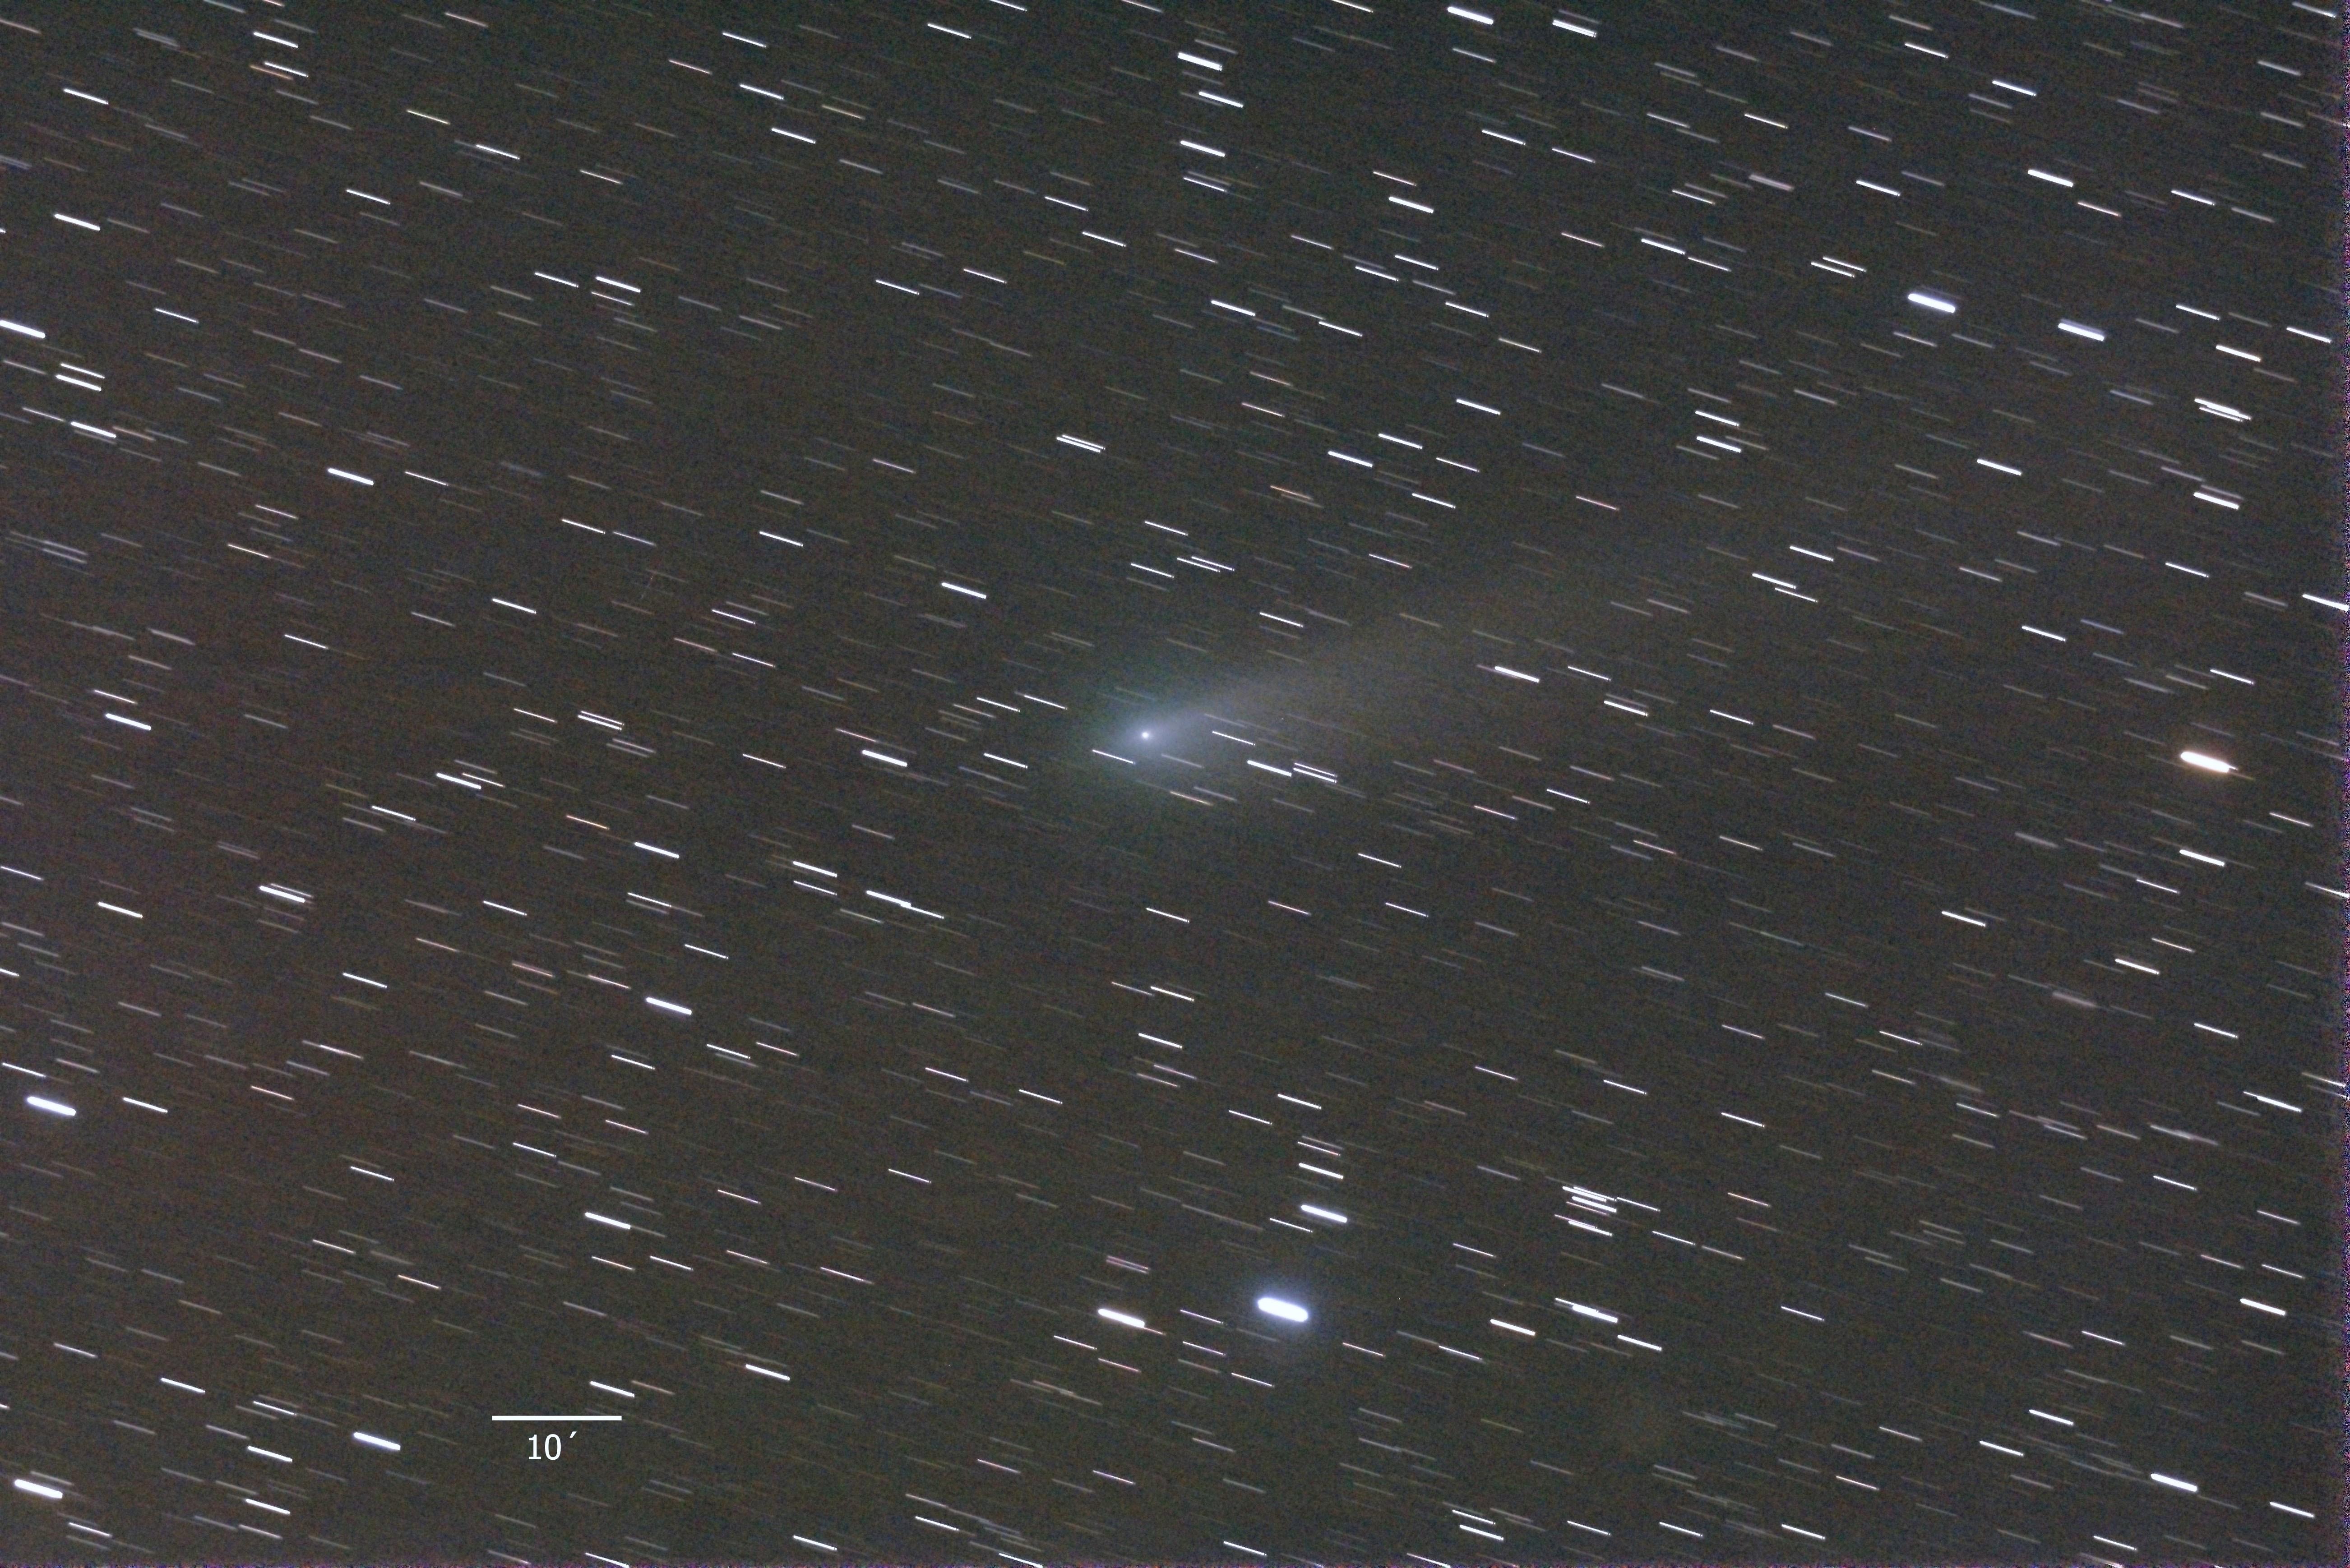 45phonda_2017_02_25_0042_0130ut_iso3200_40x60s_add_komet_txt